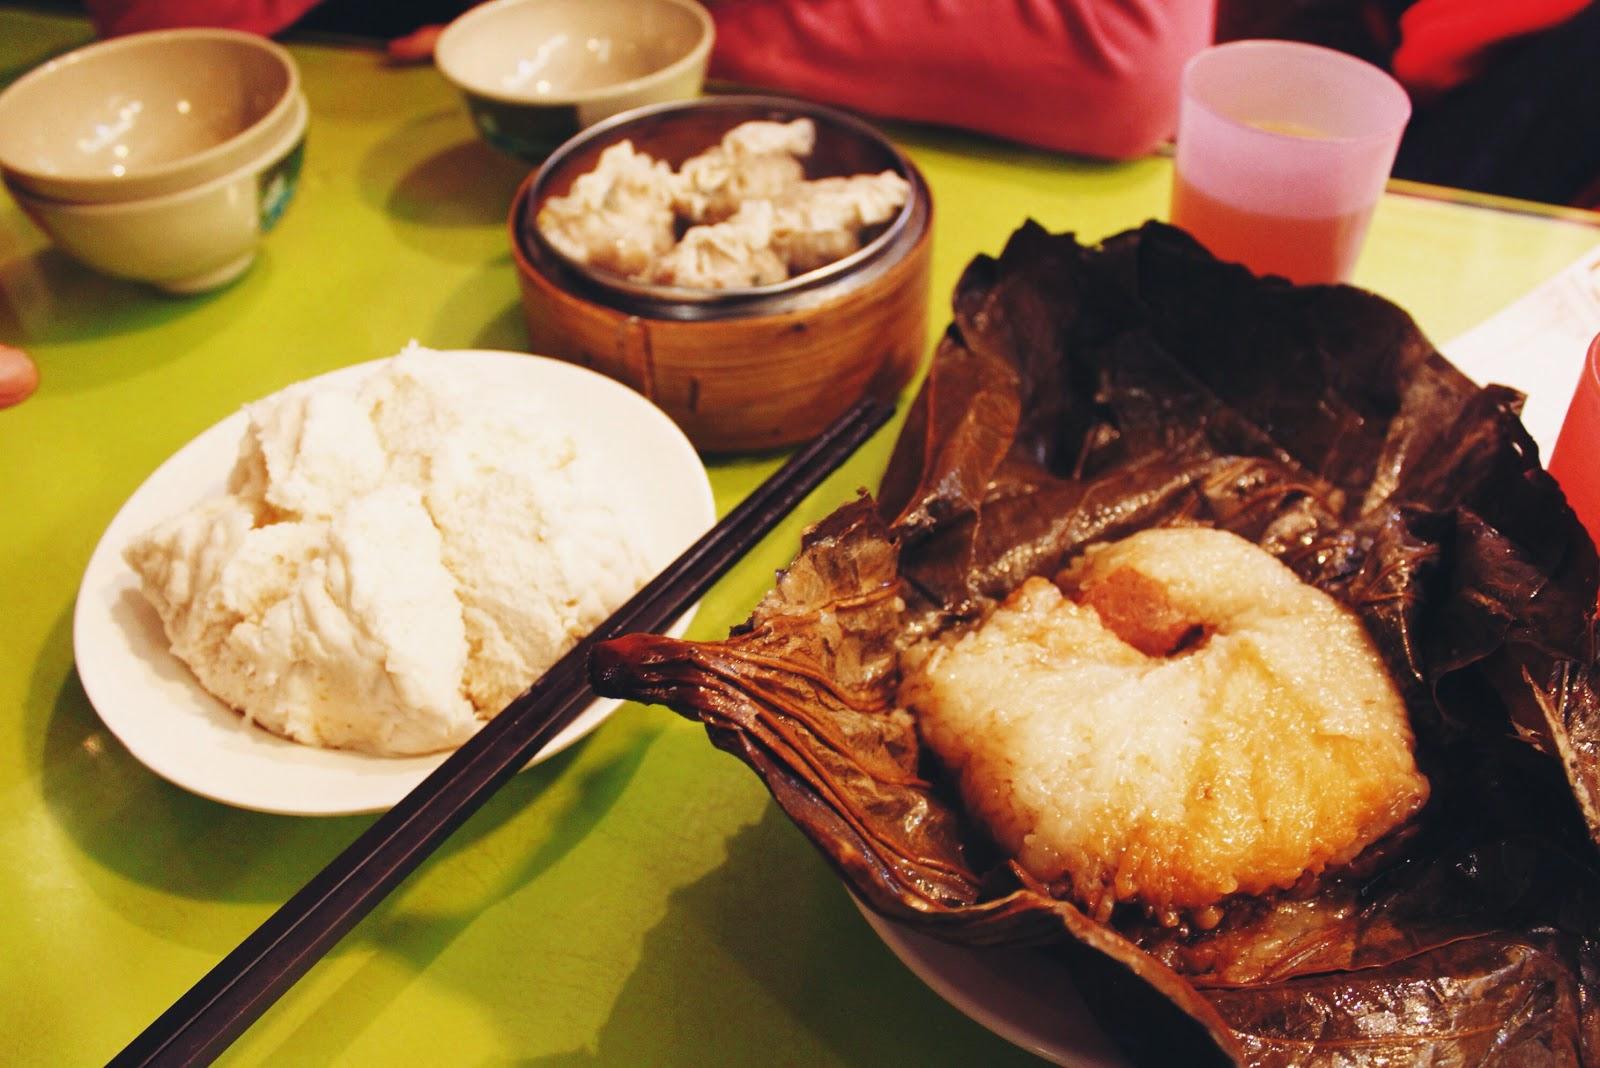 港式點心, 富麗餐廳 Fu Li Restaurant @ 香港元朗 Yuen Long, Hong Kong